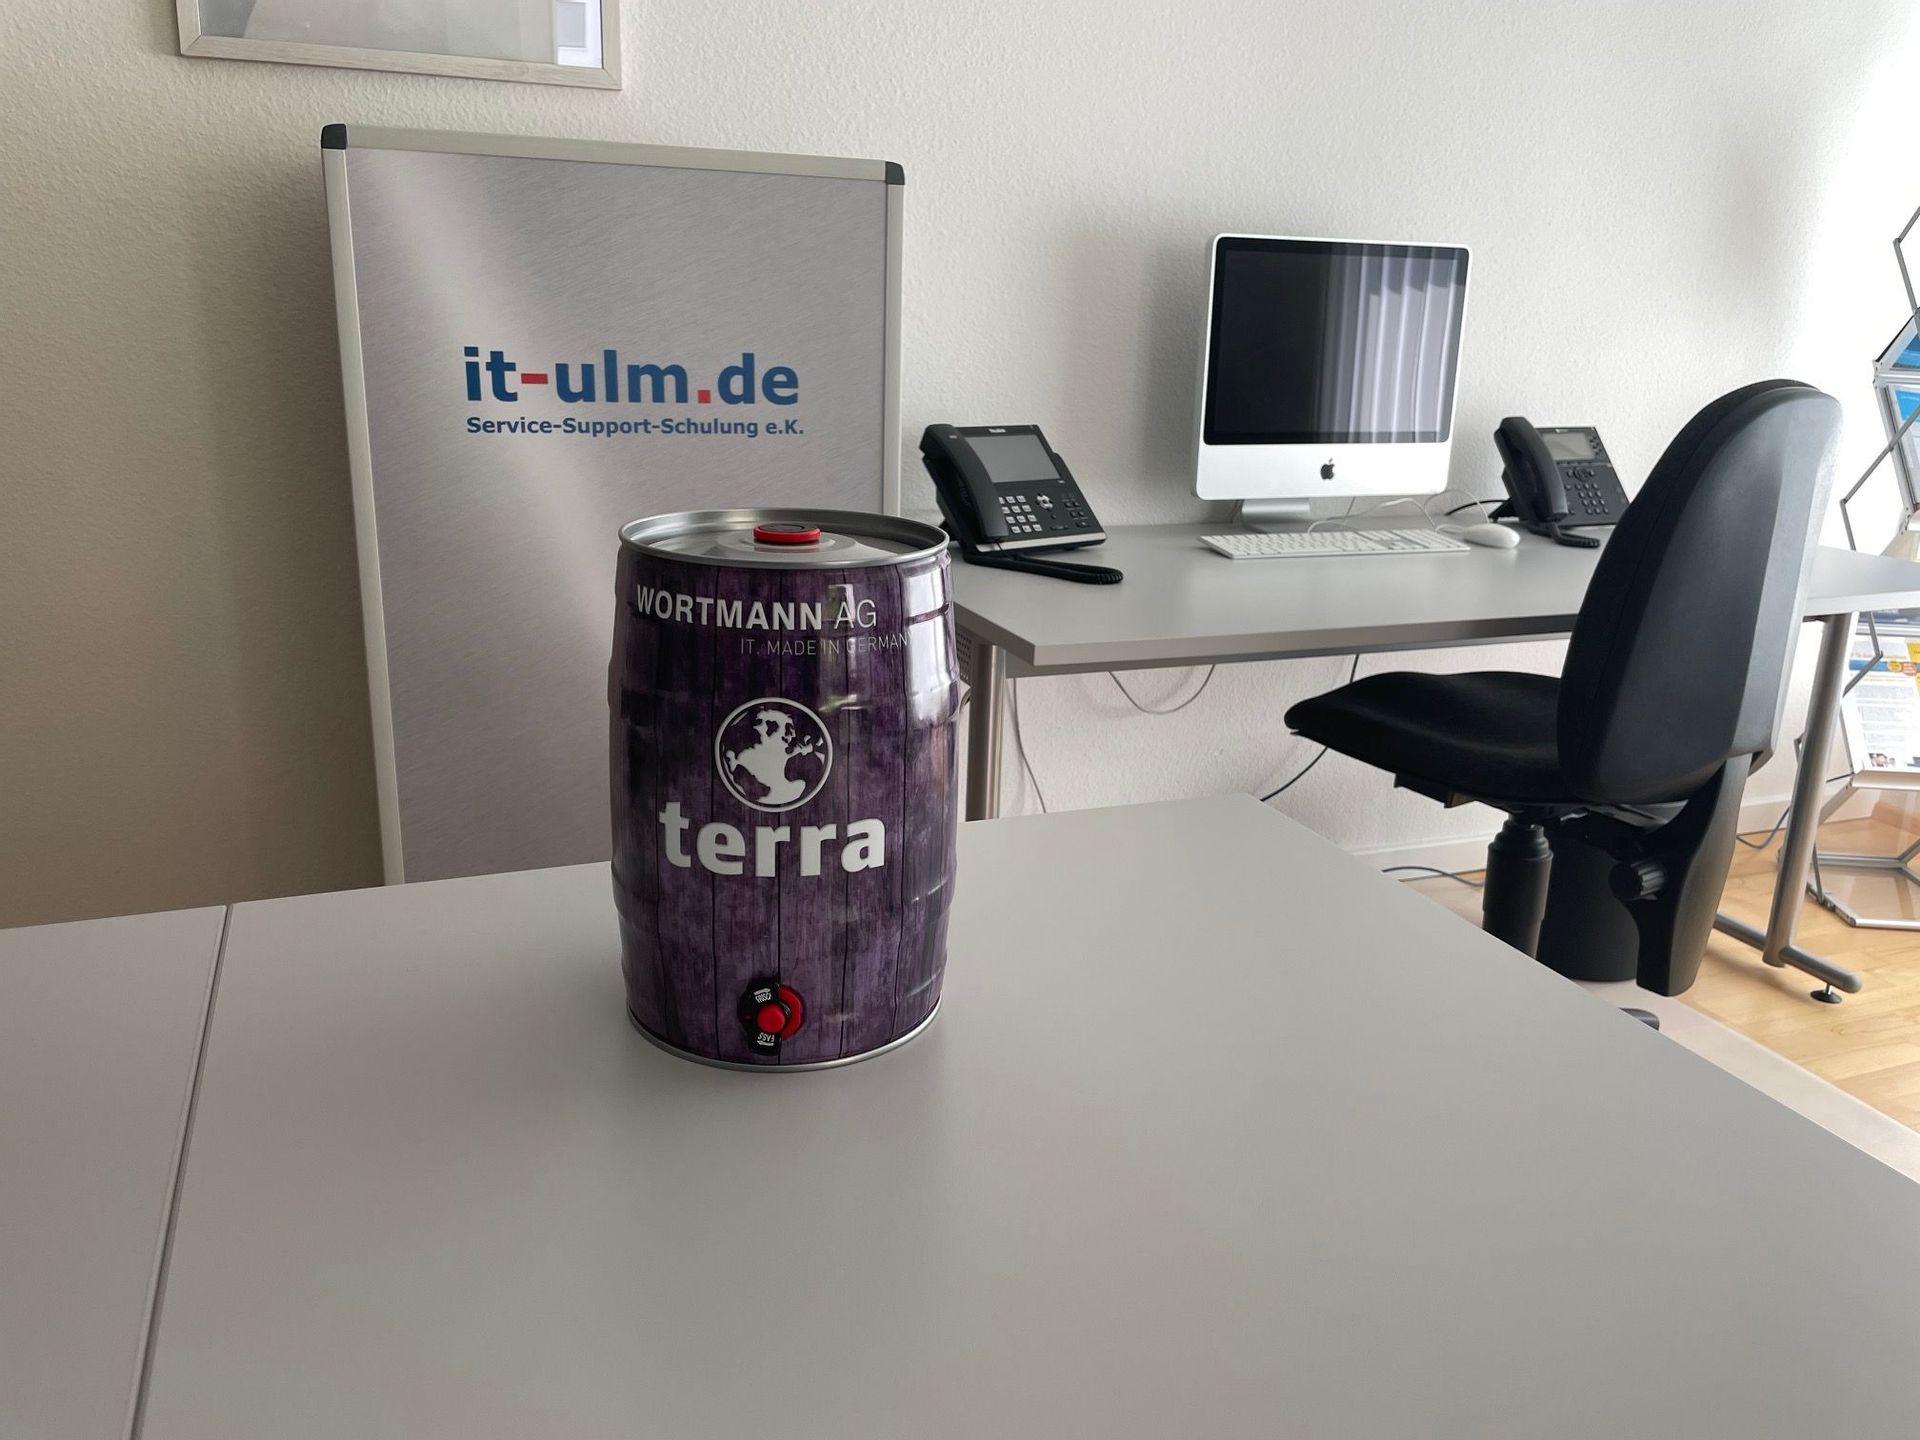 Aktuell | it-ulm.de Service-Support-Schulung e.K.